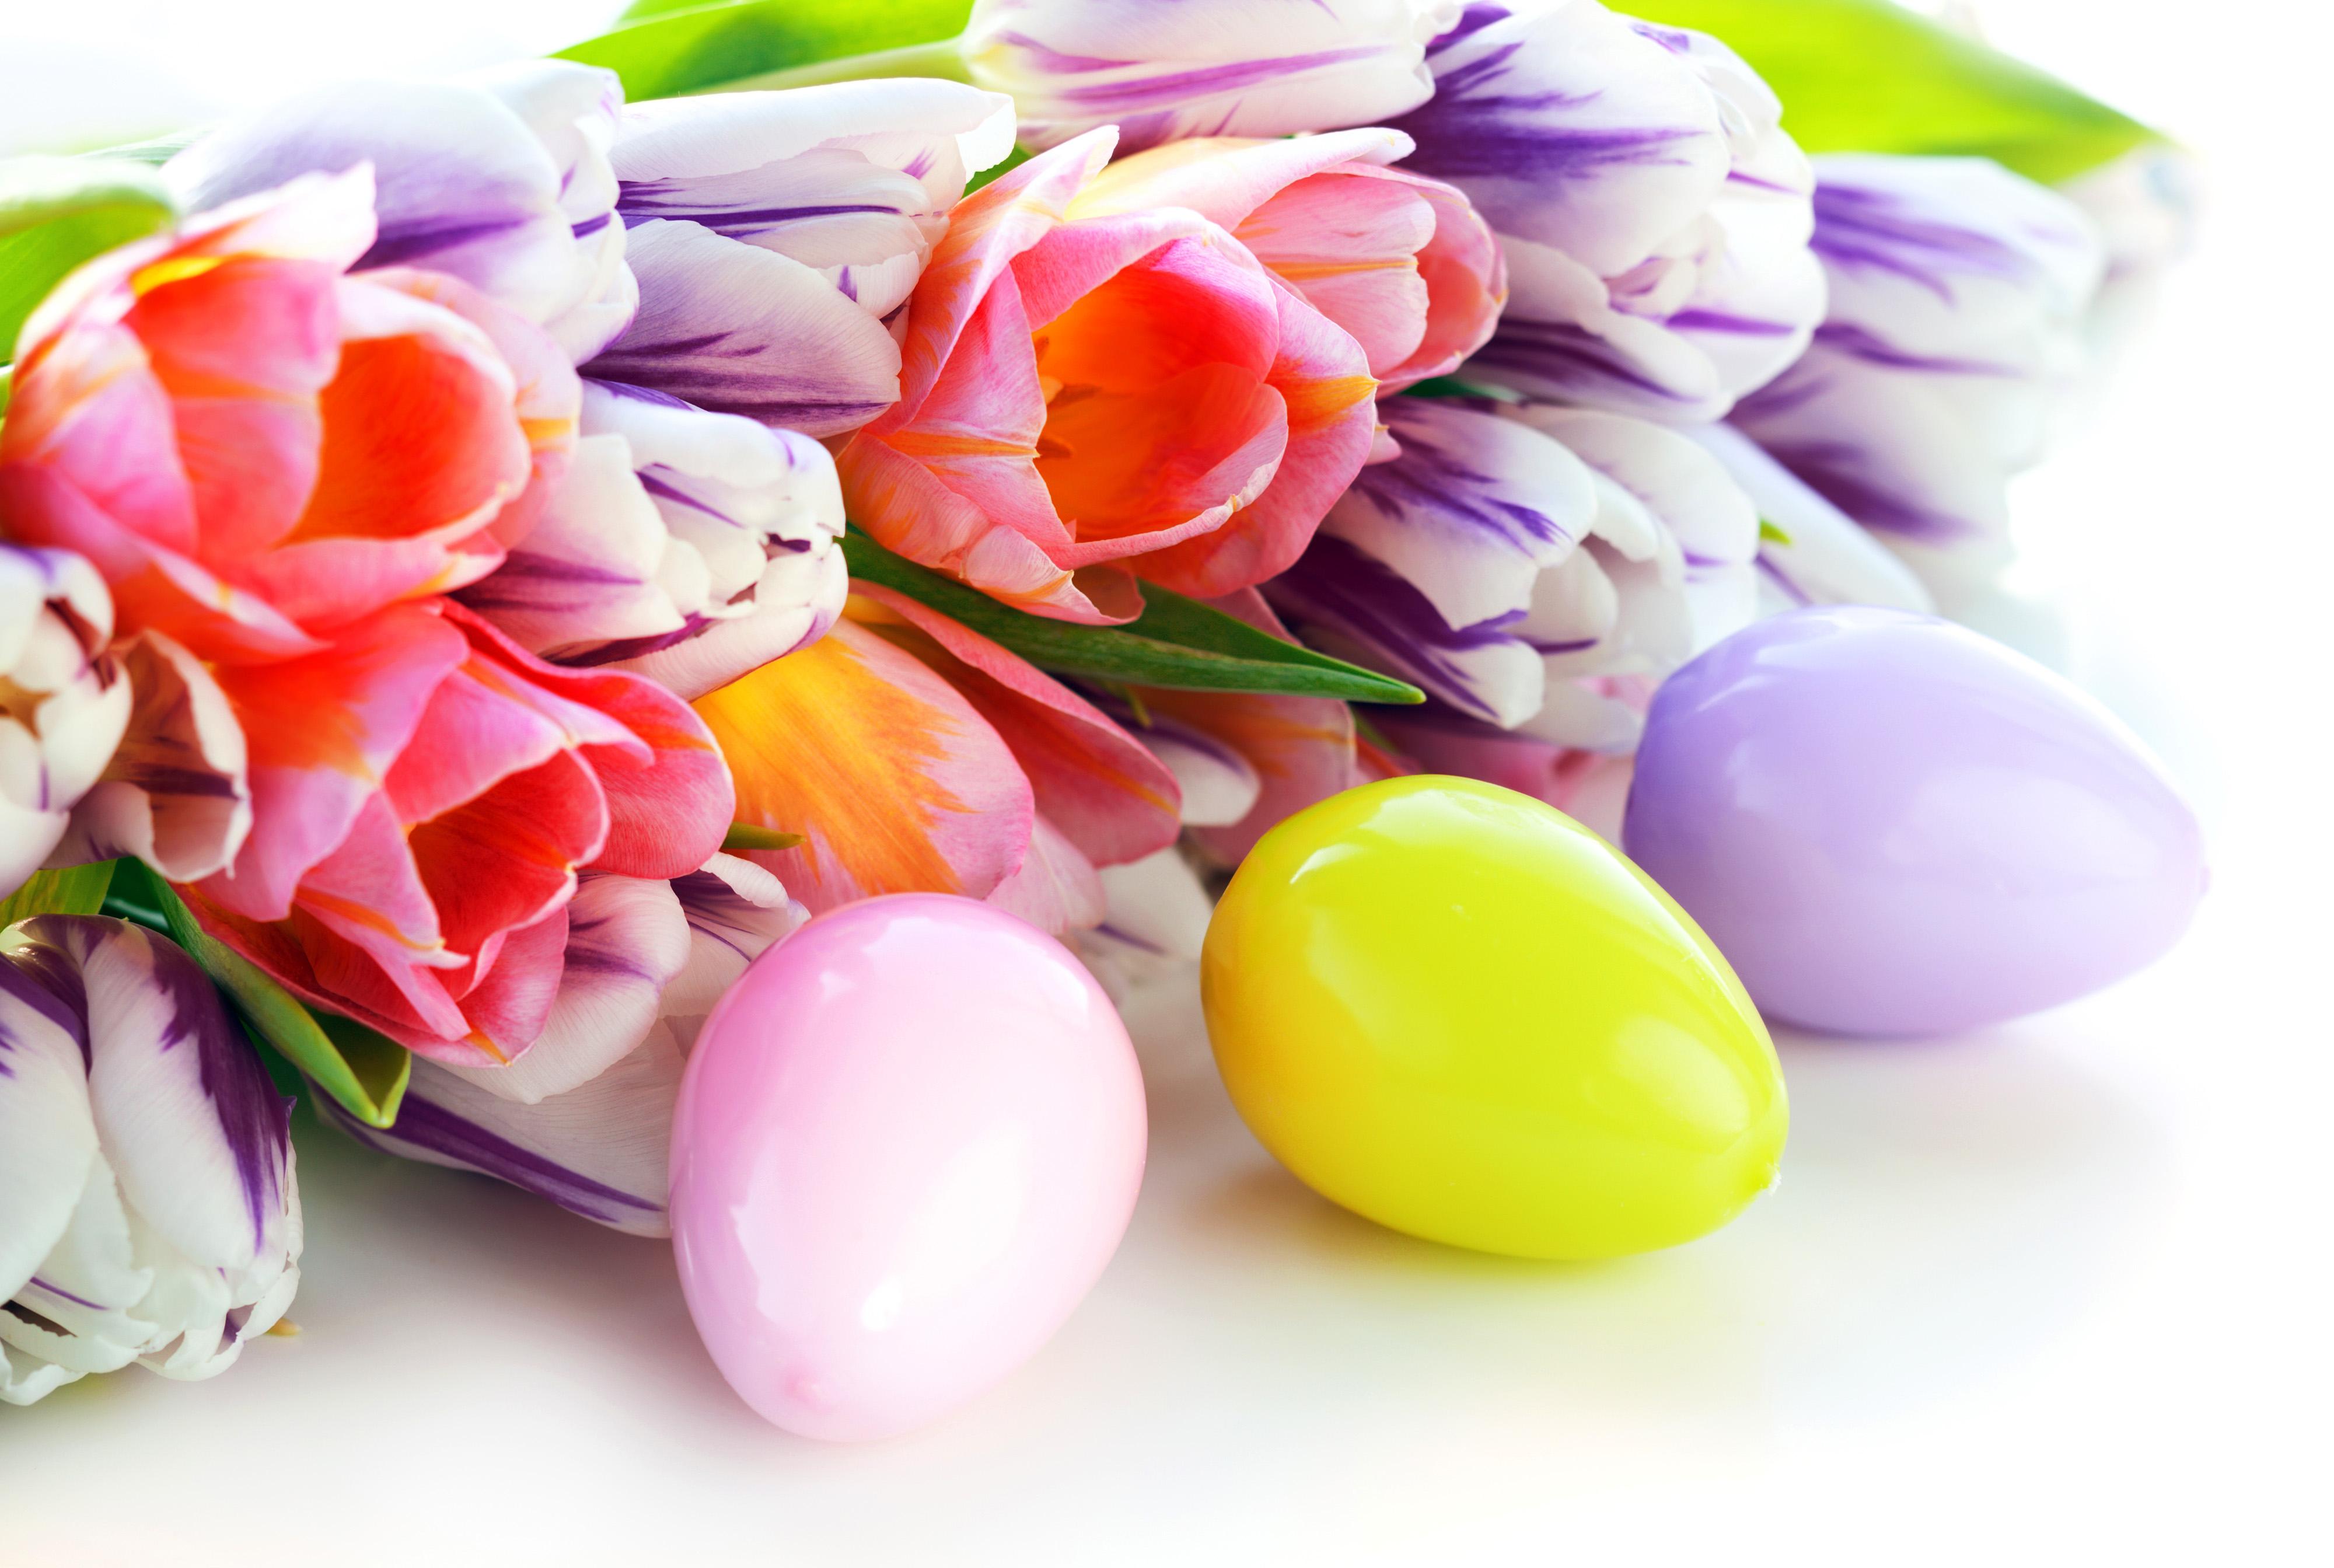 HDoboi.Kiev.ua - Крашеные яйца и разноцветные тюльпаны на Пасху